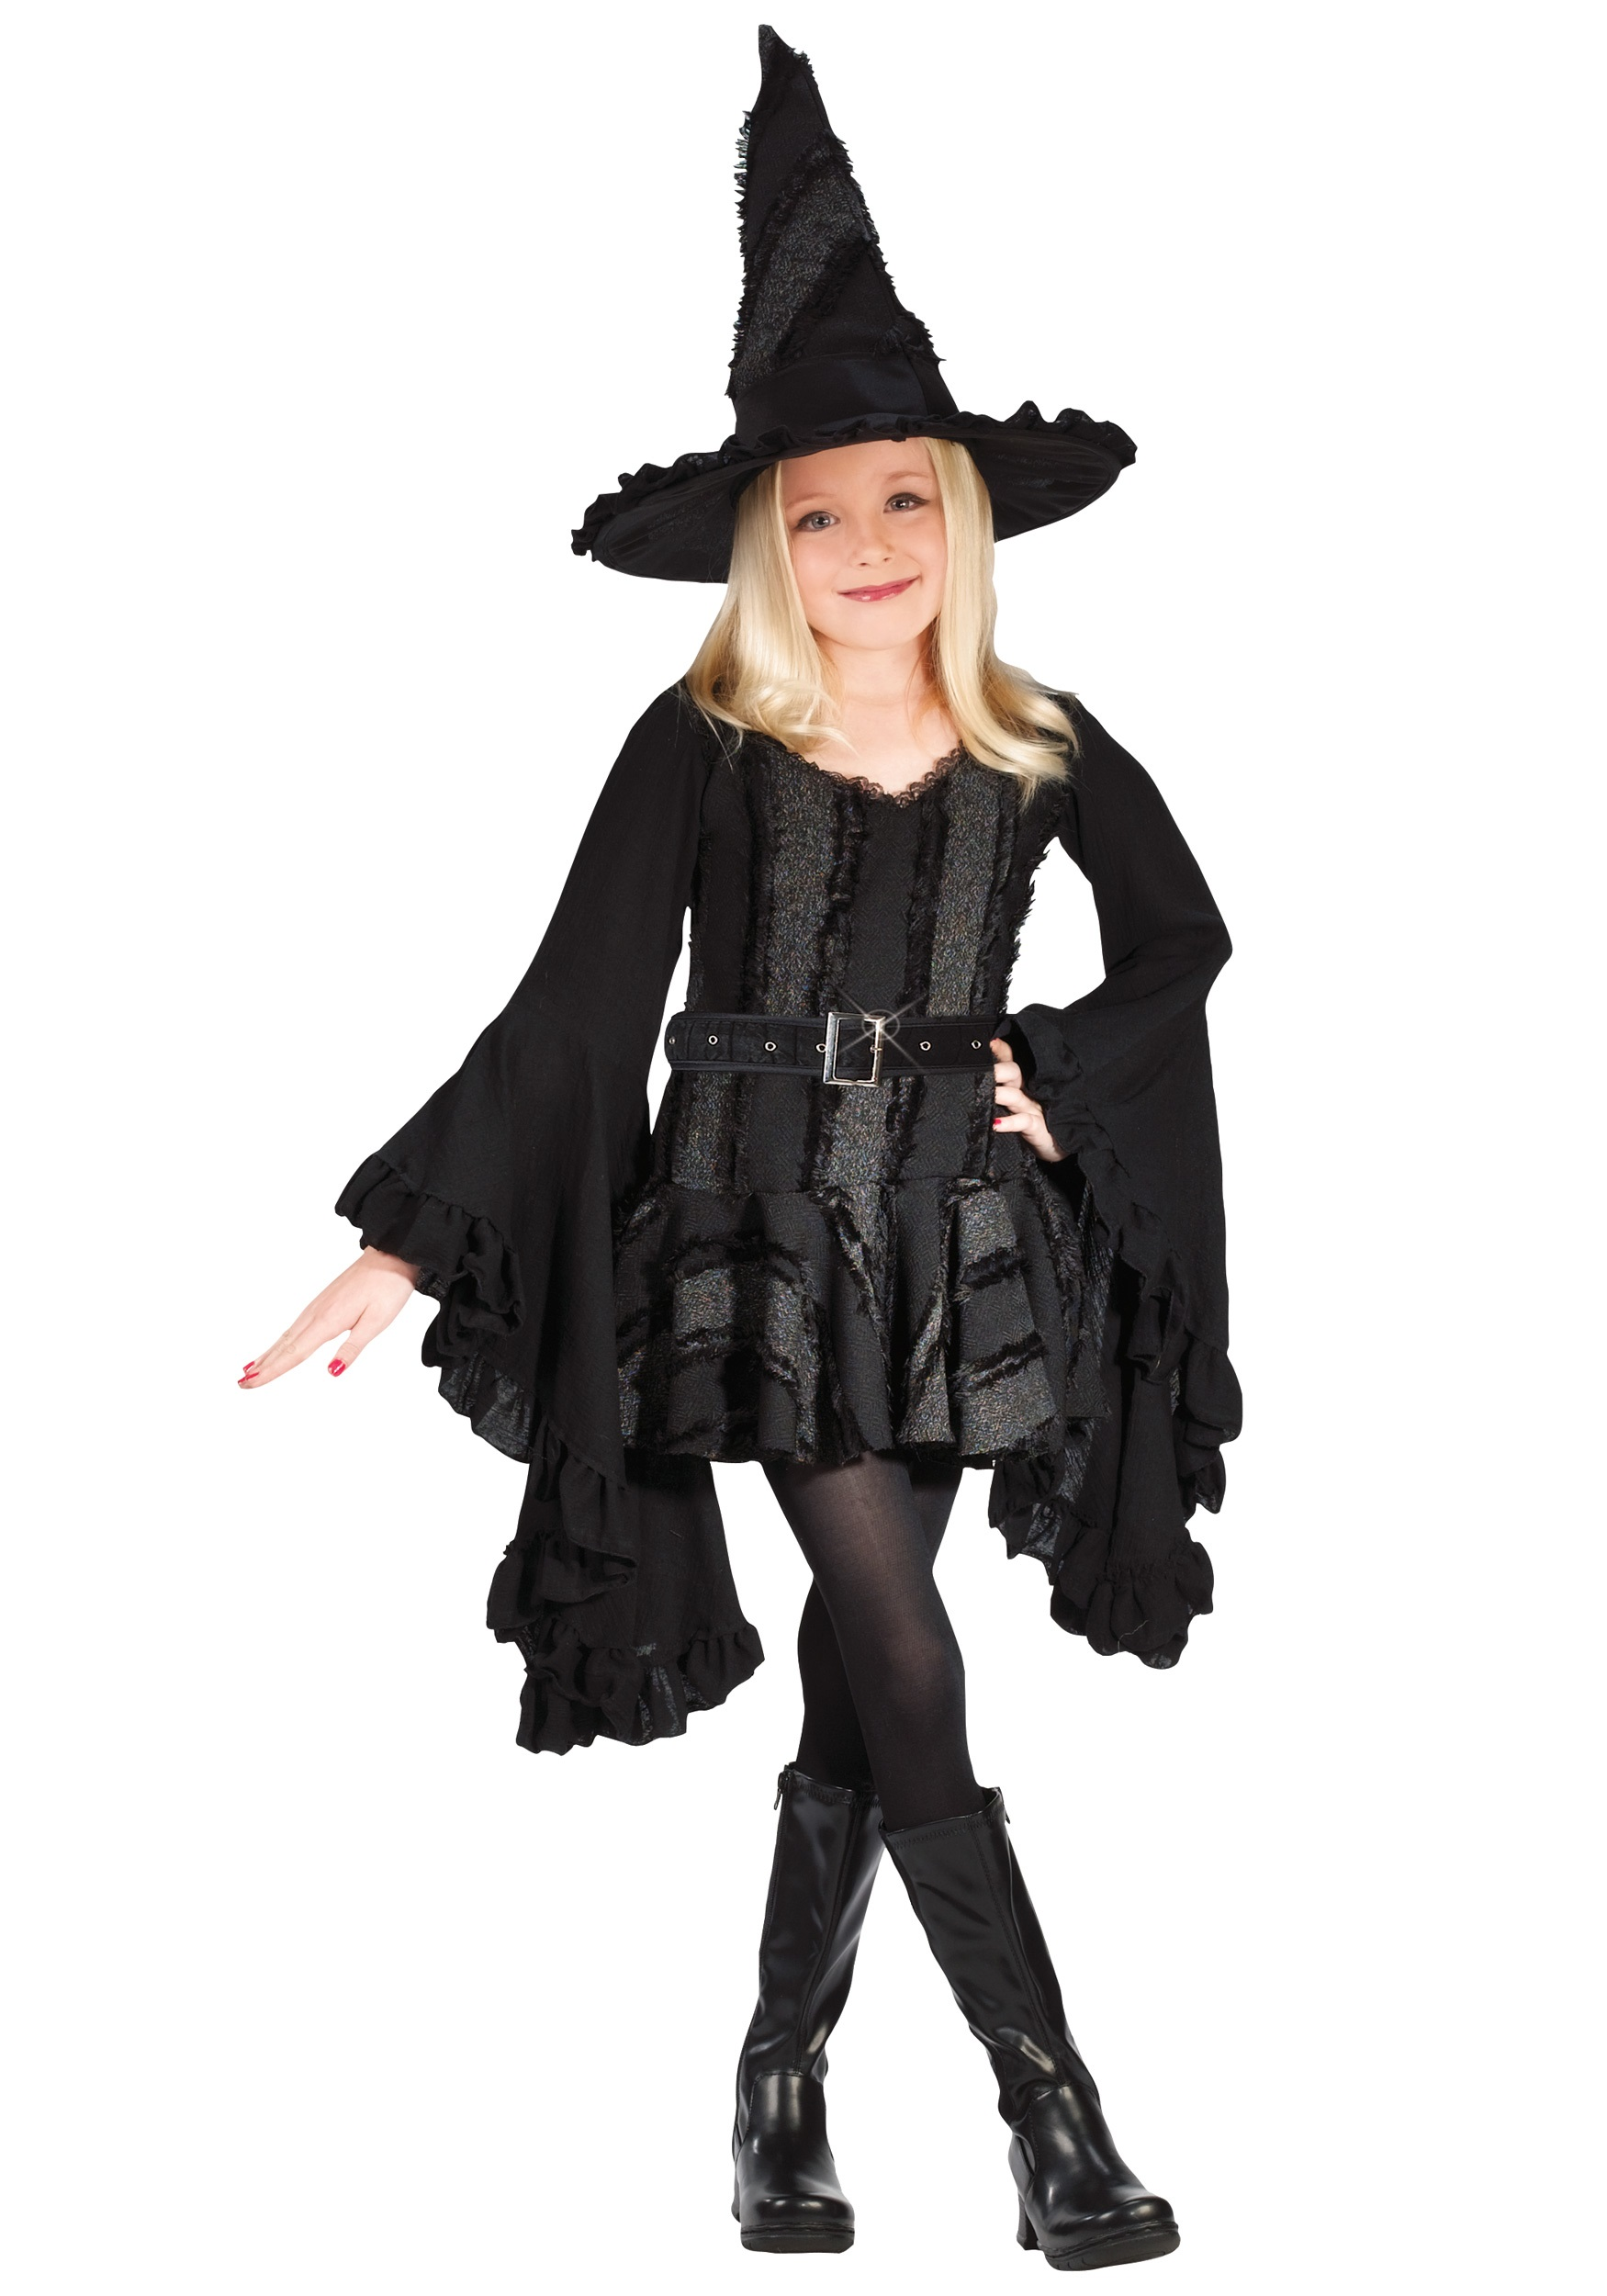 Barbie halloween costume sexy